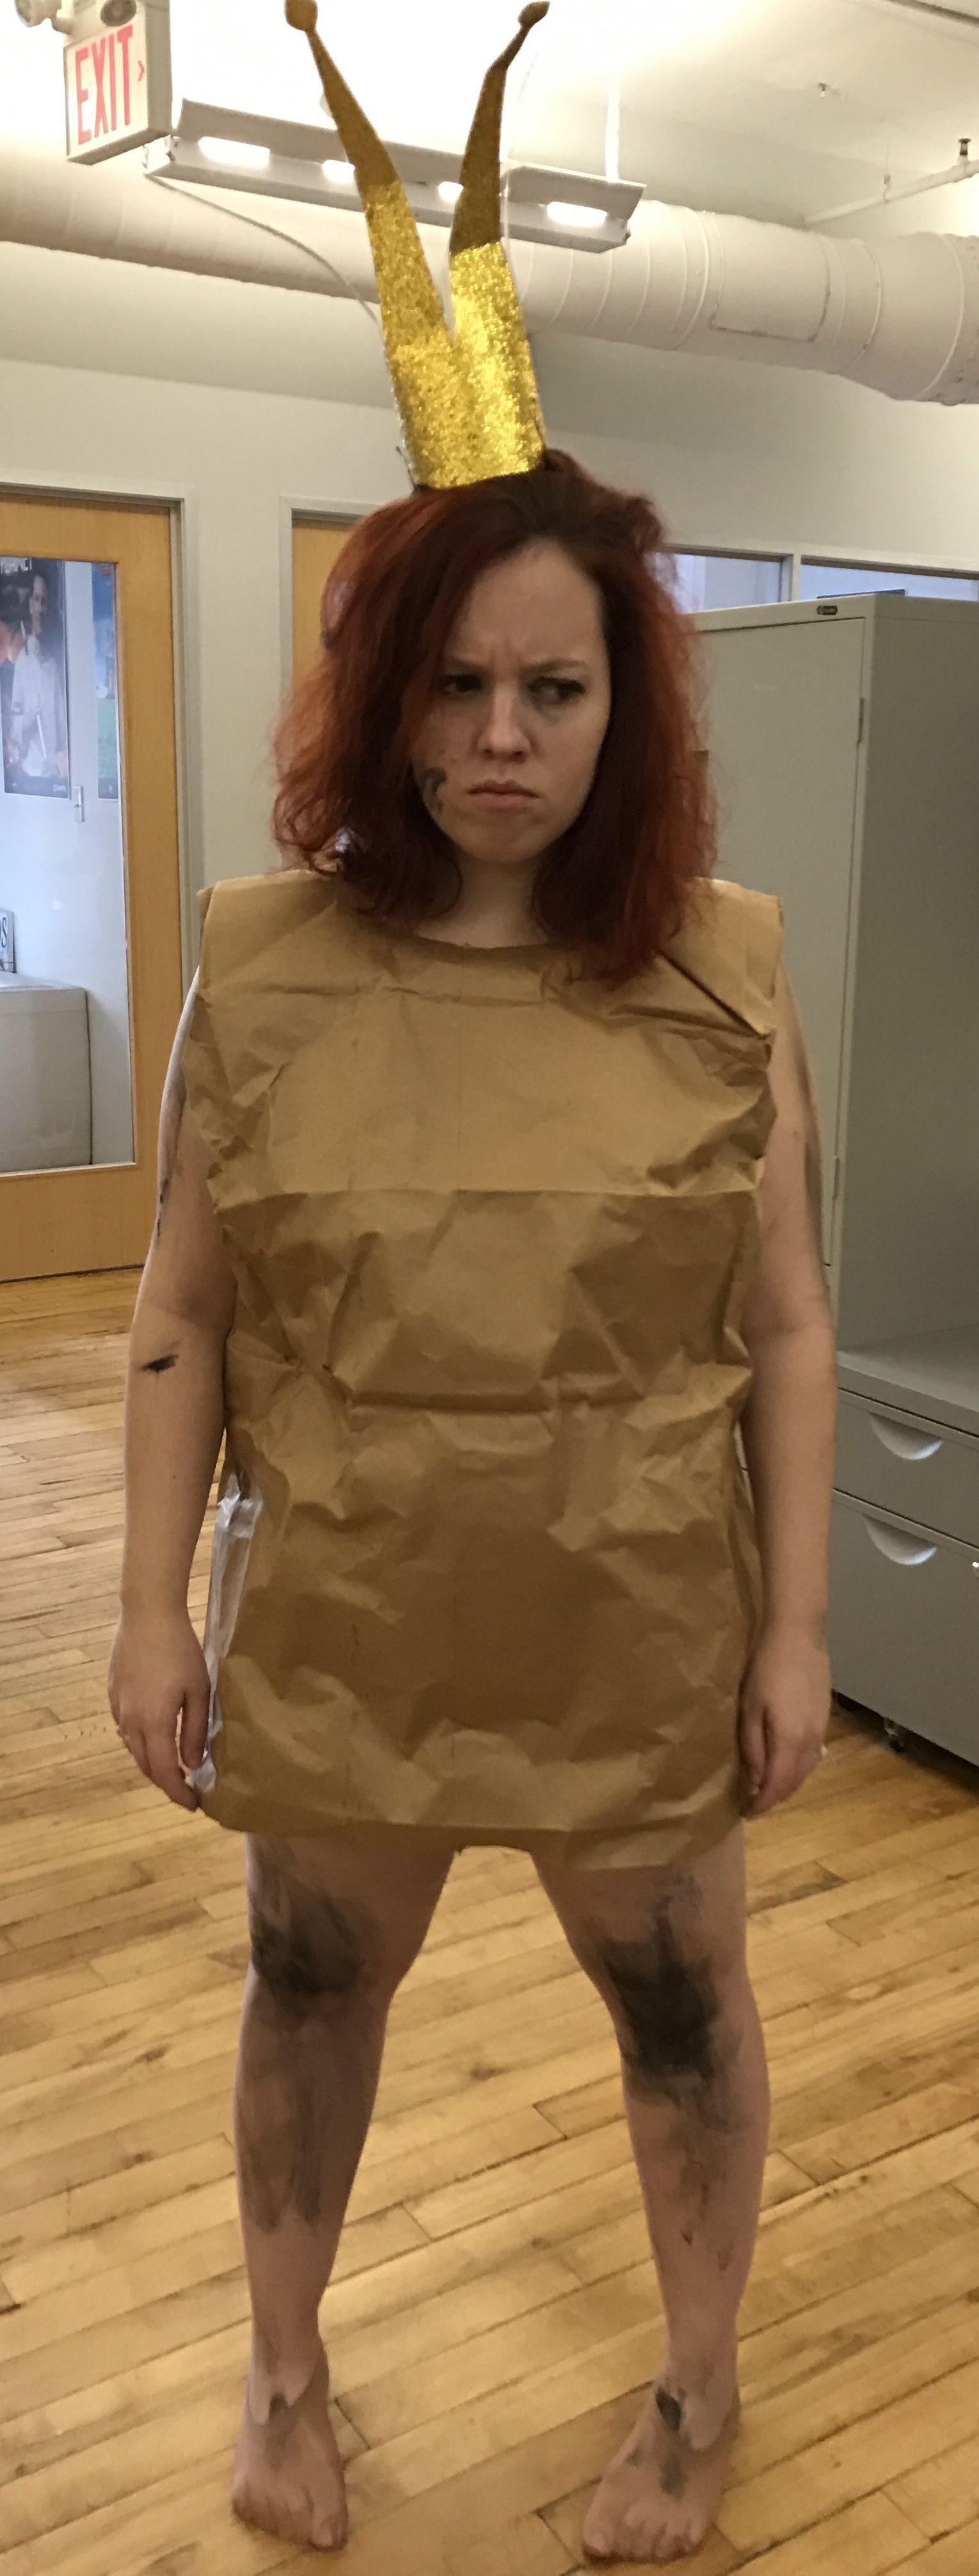 Halloween Costume 2016 - Paper Bag Princess Costume #paperbagprincess #paperbagprincesscostume #paperbag #robertmunsch #homemadecostume #halloweencostume #easycostume #cheapcostume #halloween #halloweenDIY #paperbagprincesscostume Halloween Costume 2016 - Paper Bag Princess Costume #paperbagprincess #paperbagprincesscostume #paperbag #robertmunsch #homemadecostume #halloweencostume #easycostume #cheapcostume #halloween #halloweenDIY #paperbagprincesscostume